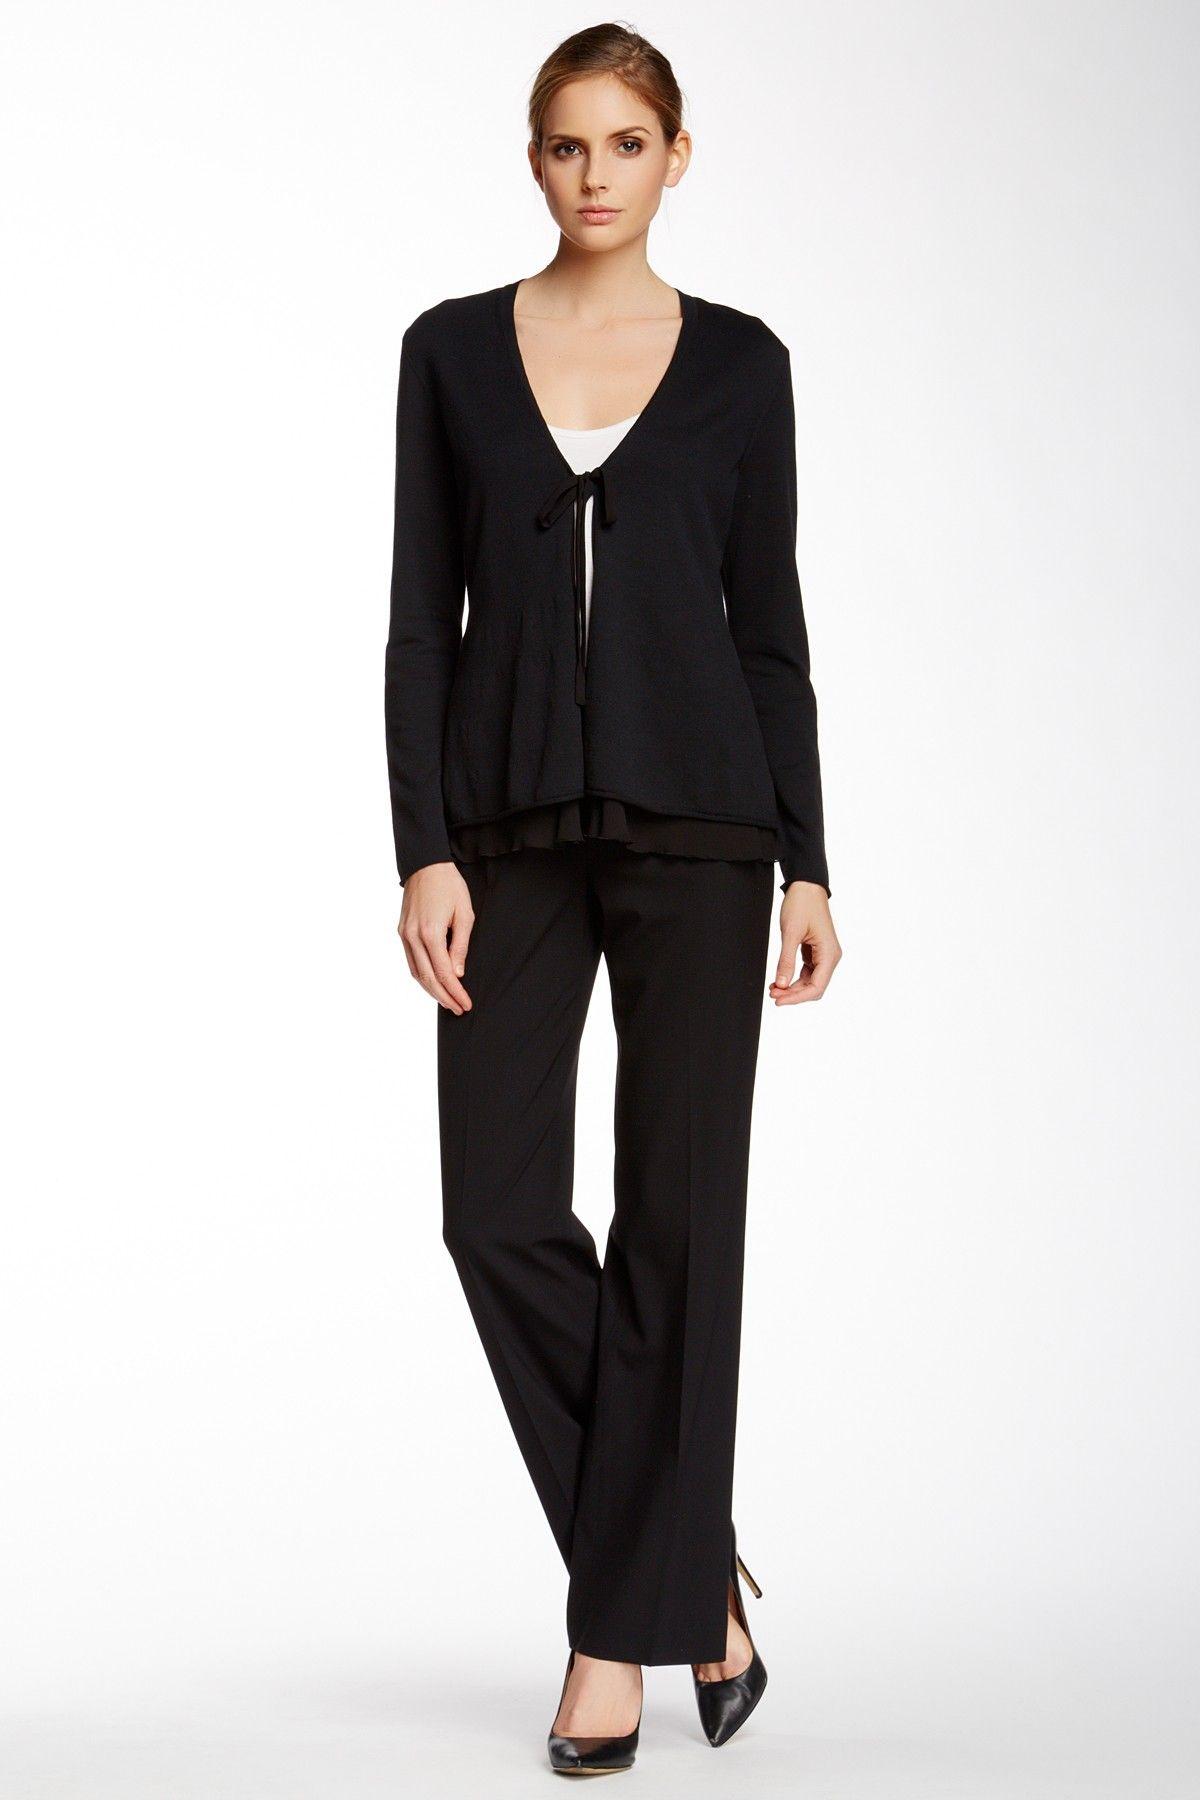 Lafayette 148 New York Classic Wool Blend Pant Suit